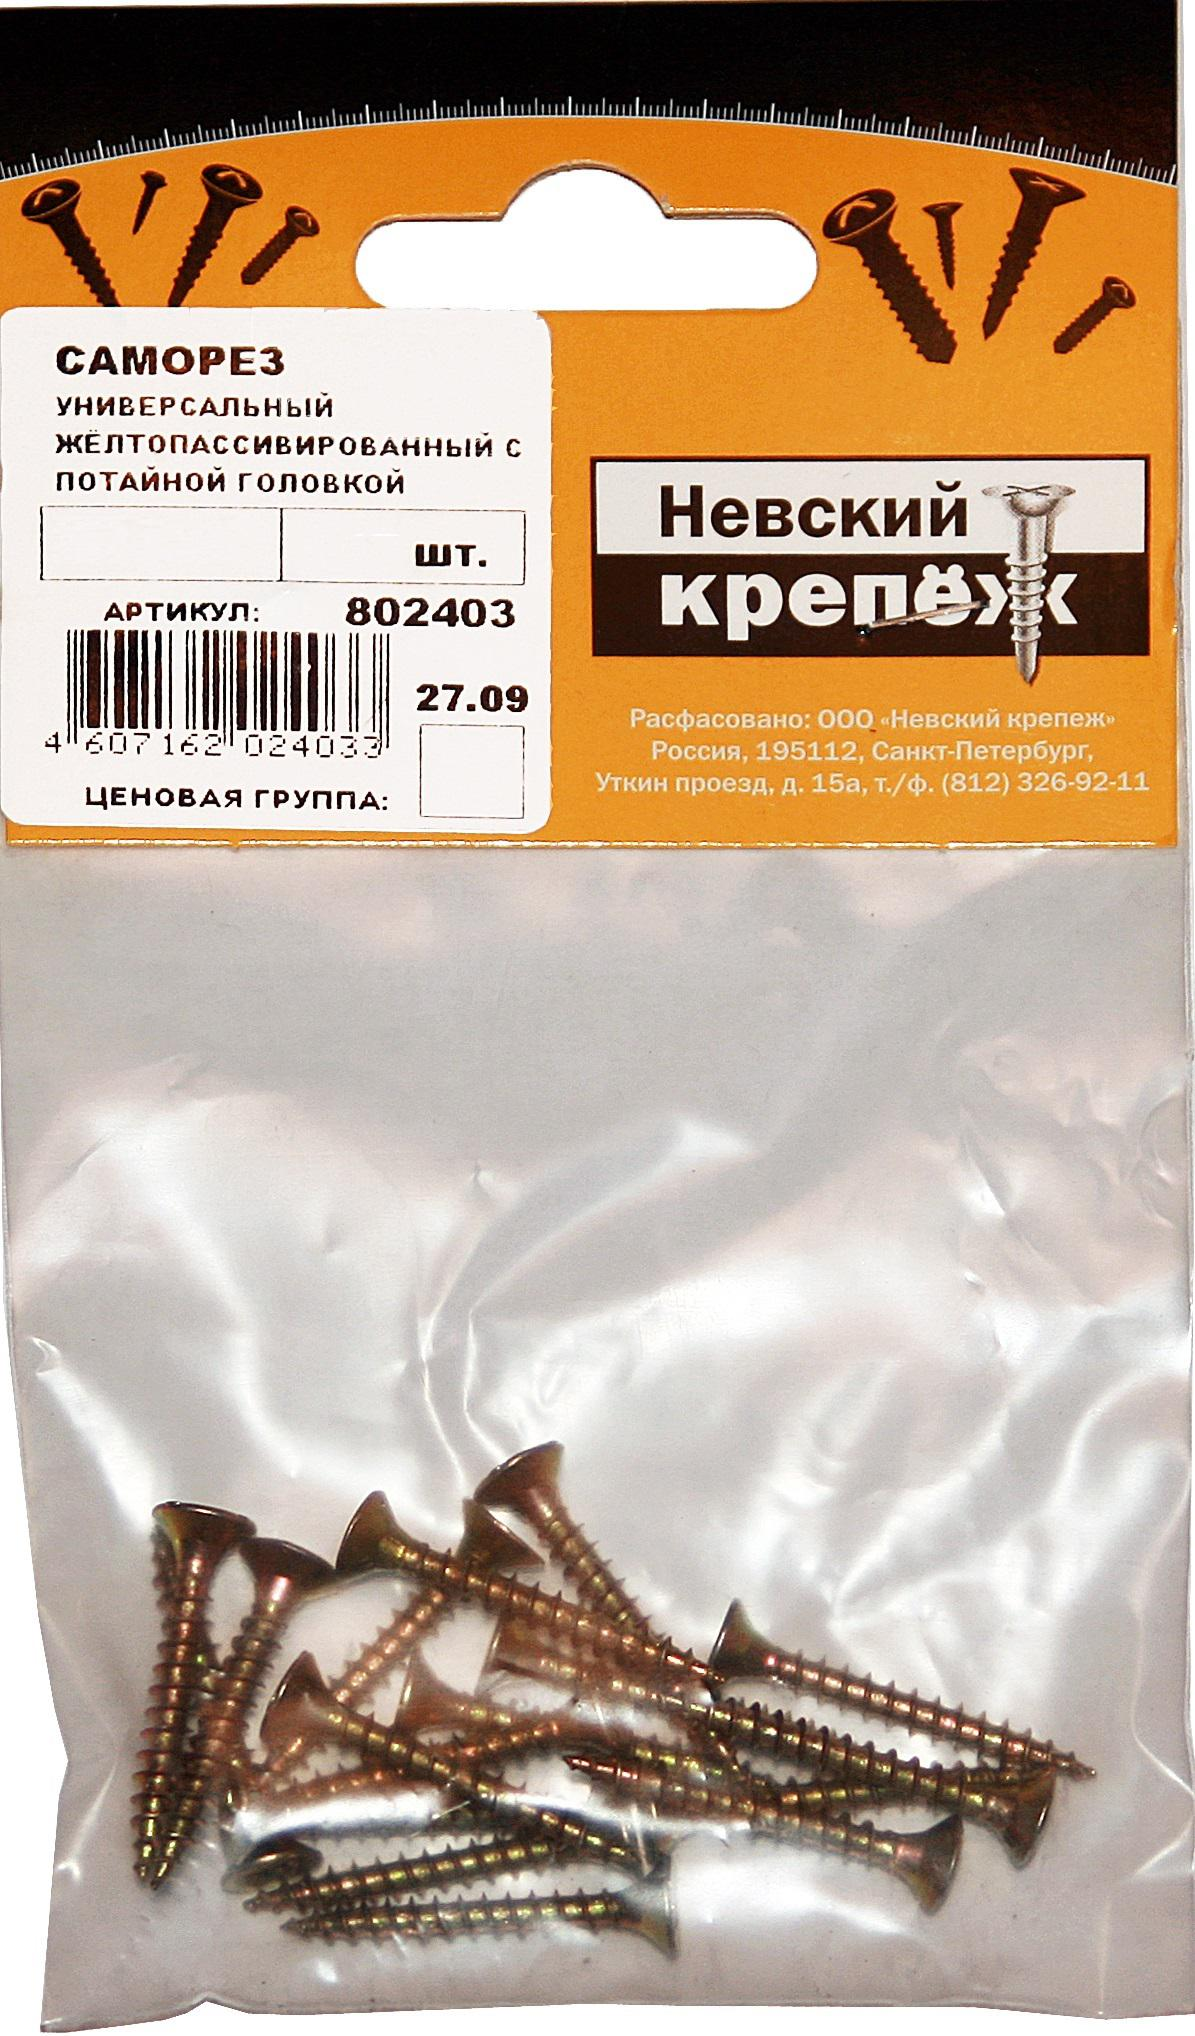 Саморез НЕВСКИЙ КРЕПЕЖ 802381